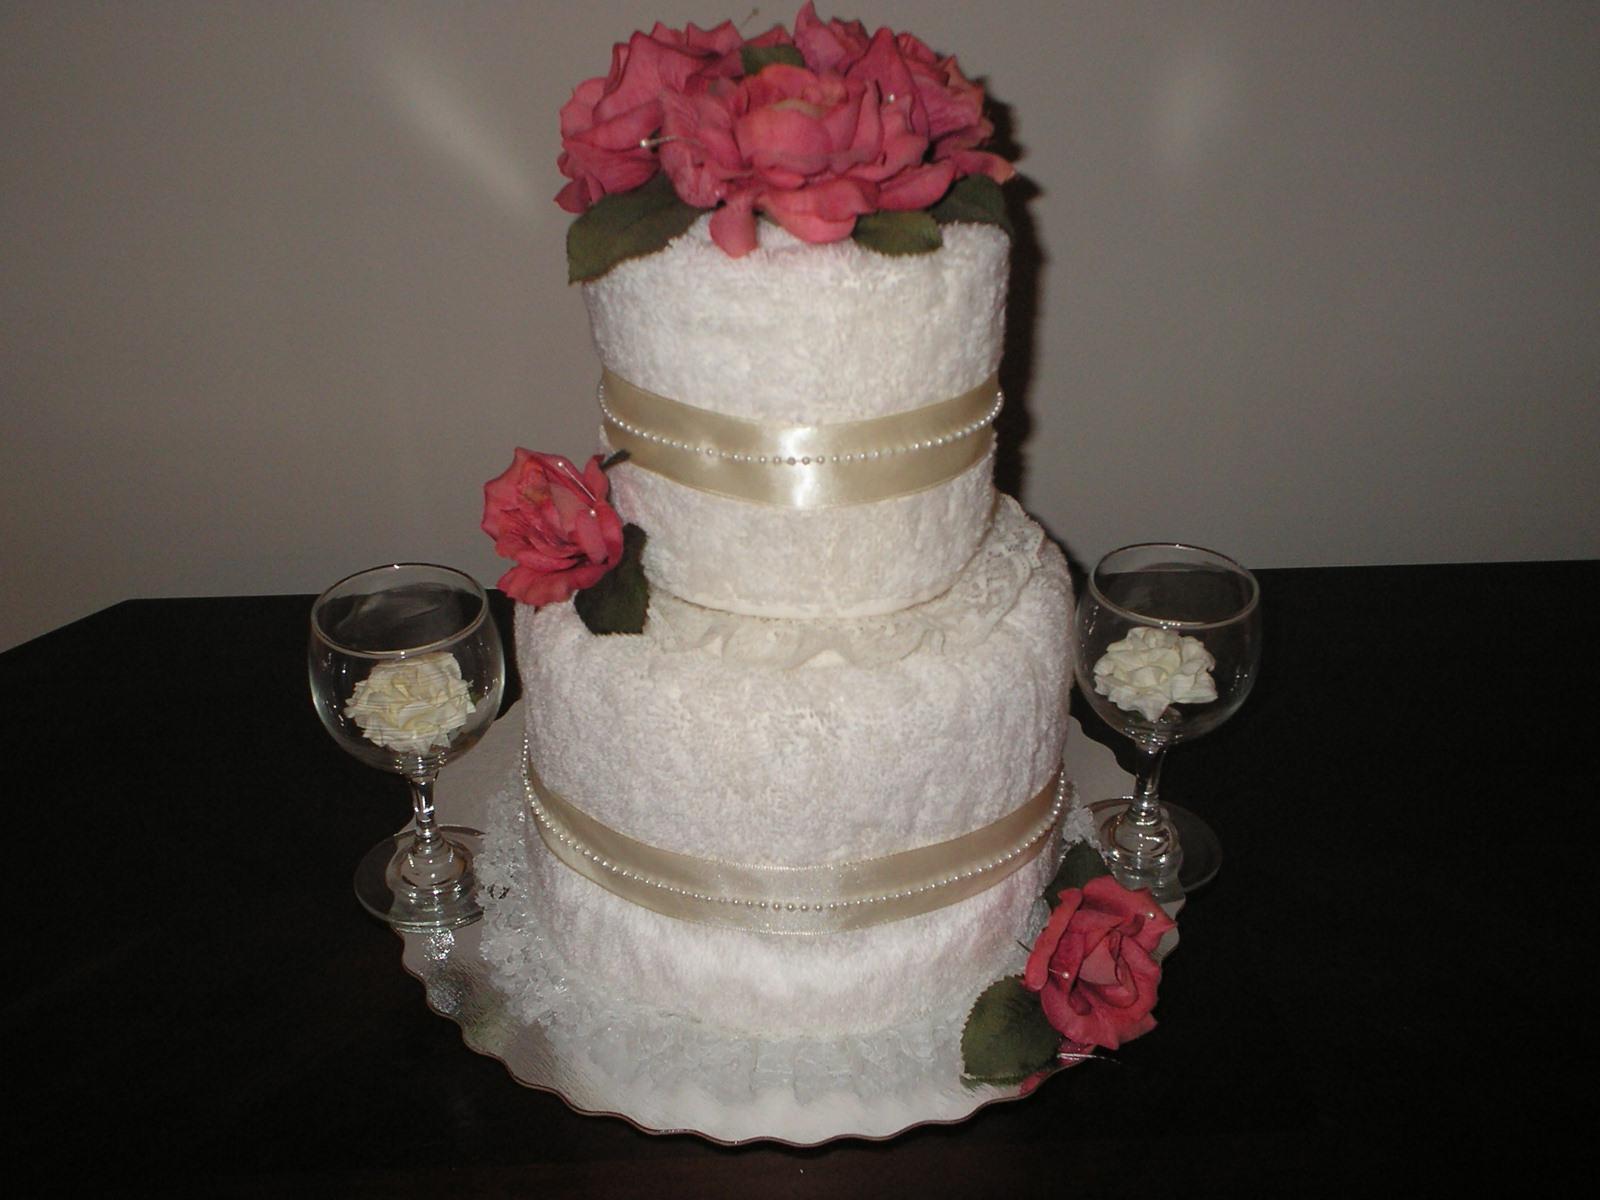 Wedding Towel Cakes Ideas  Wedding towel cakes ideas idea in 2017